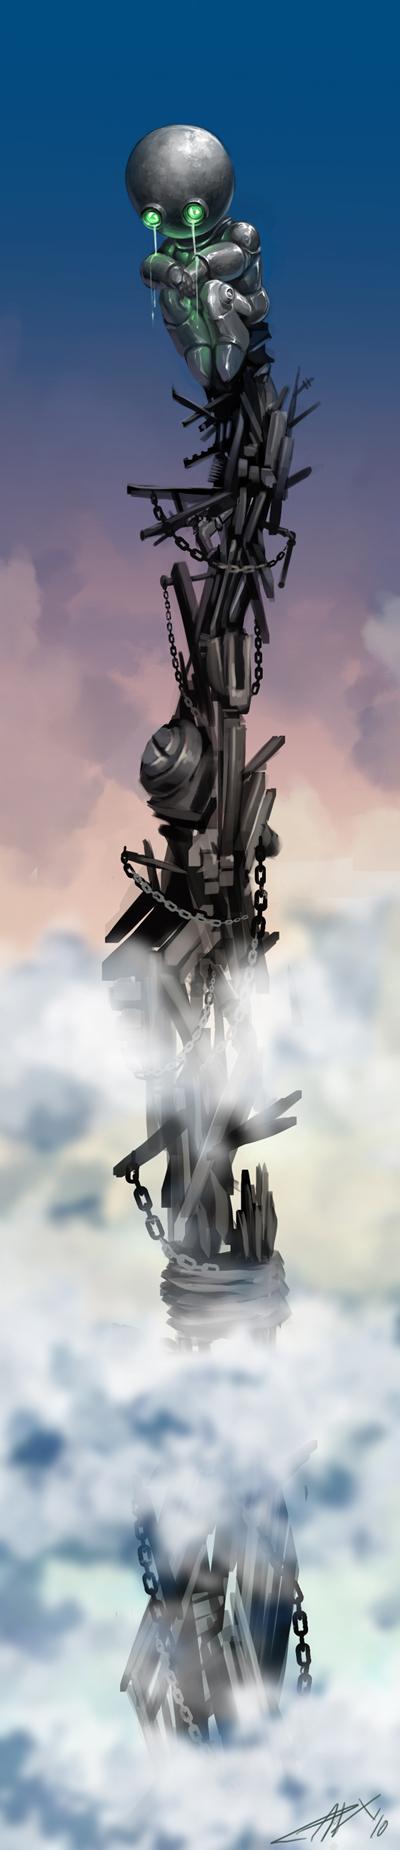 Lonely Robo by Titanbolzen